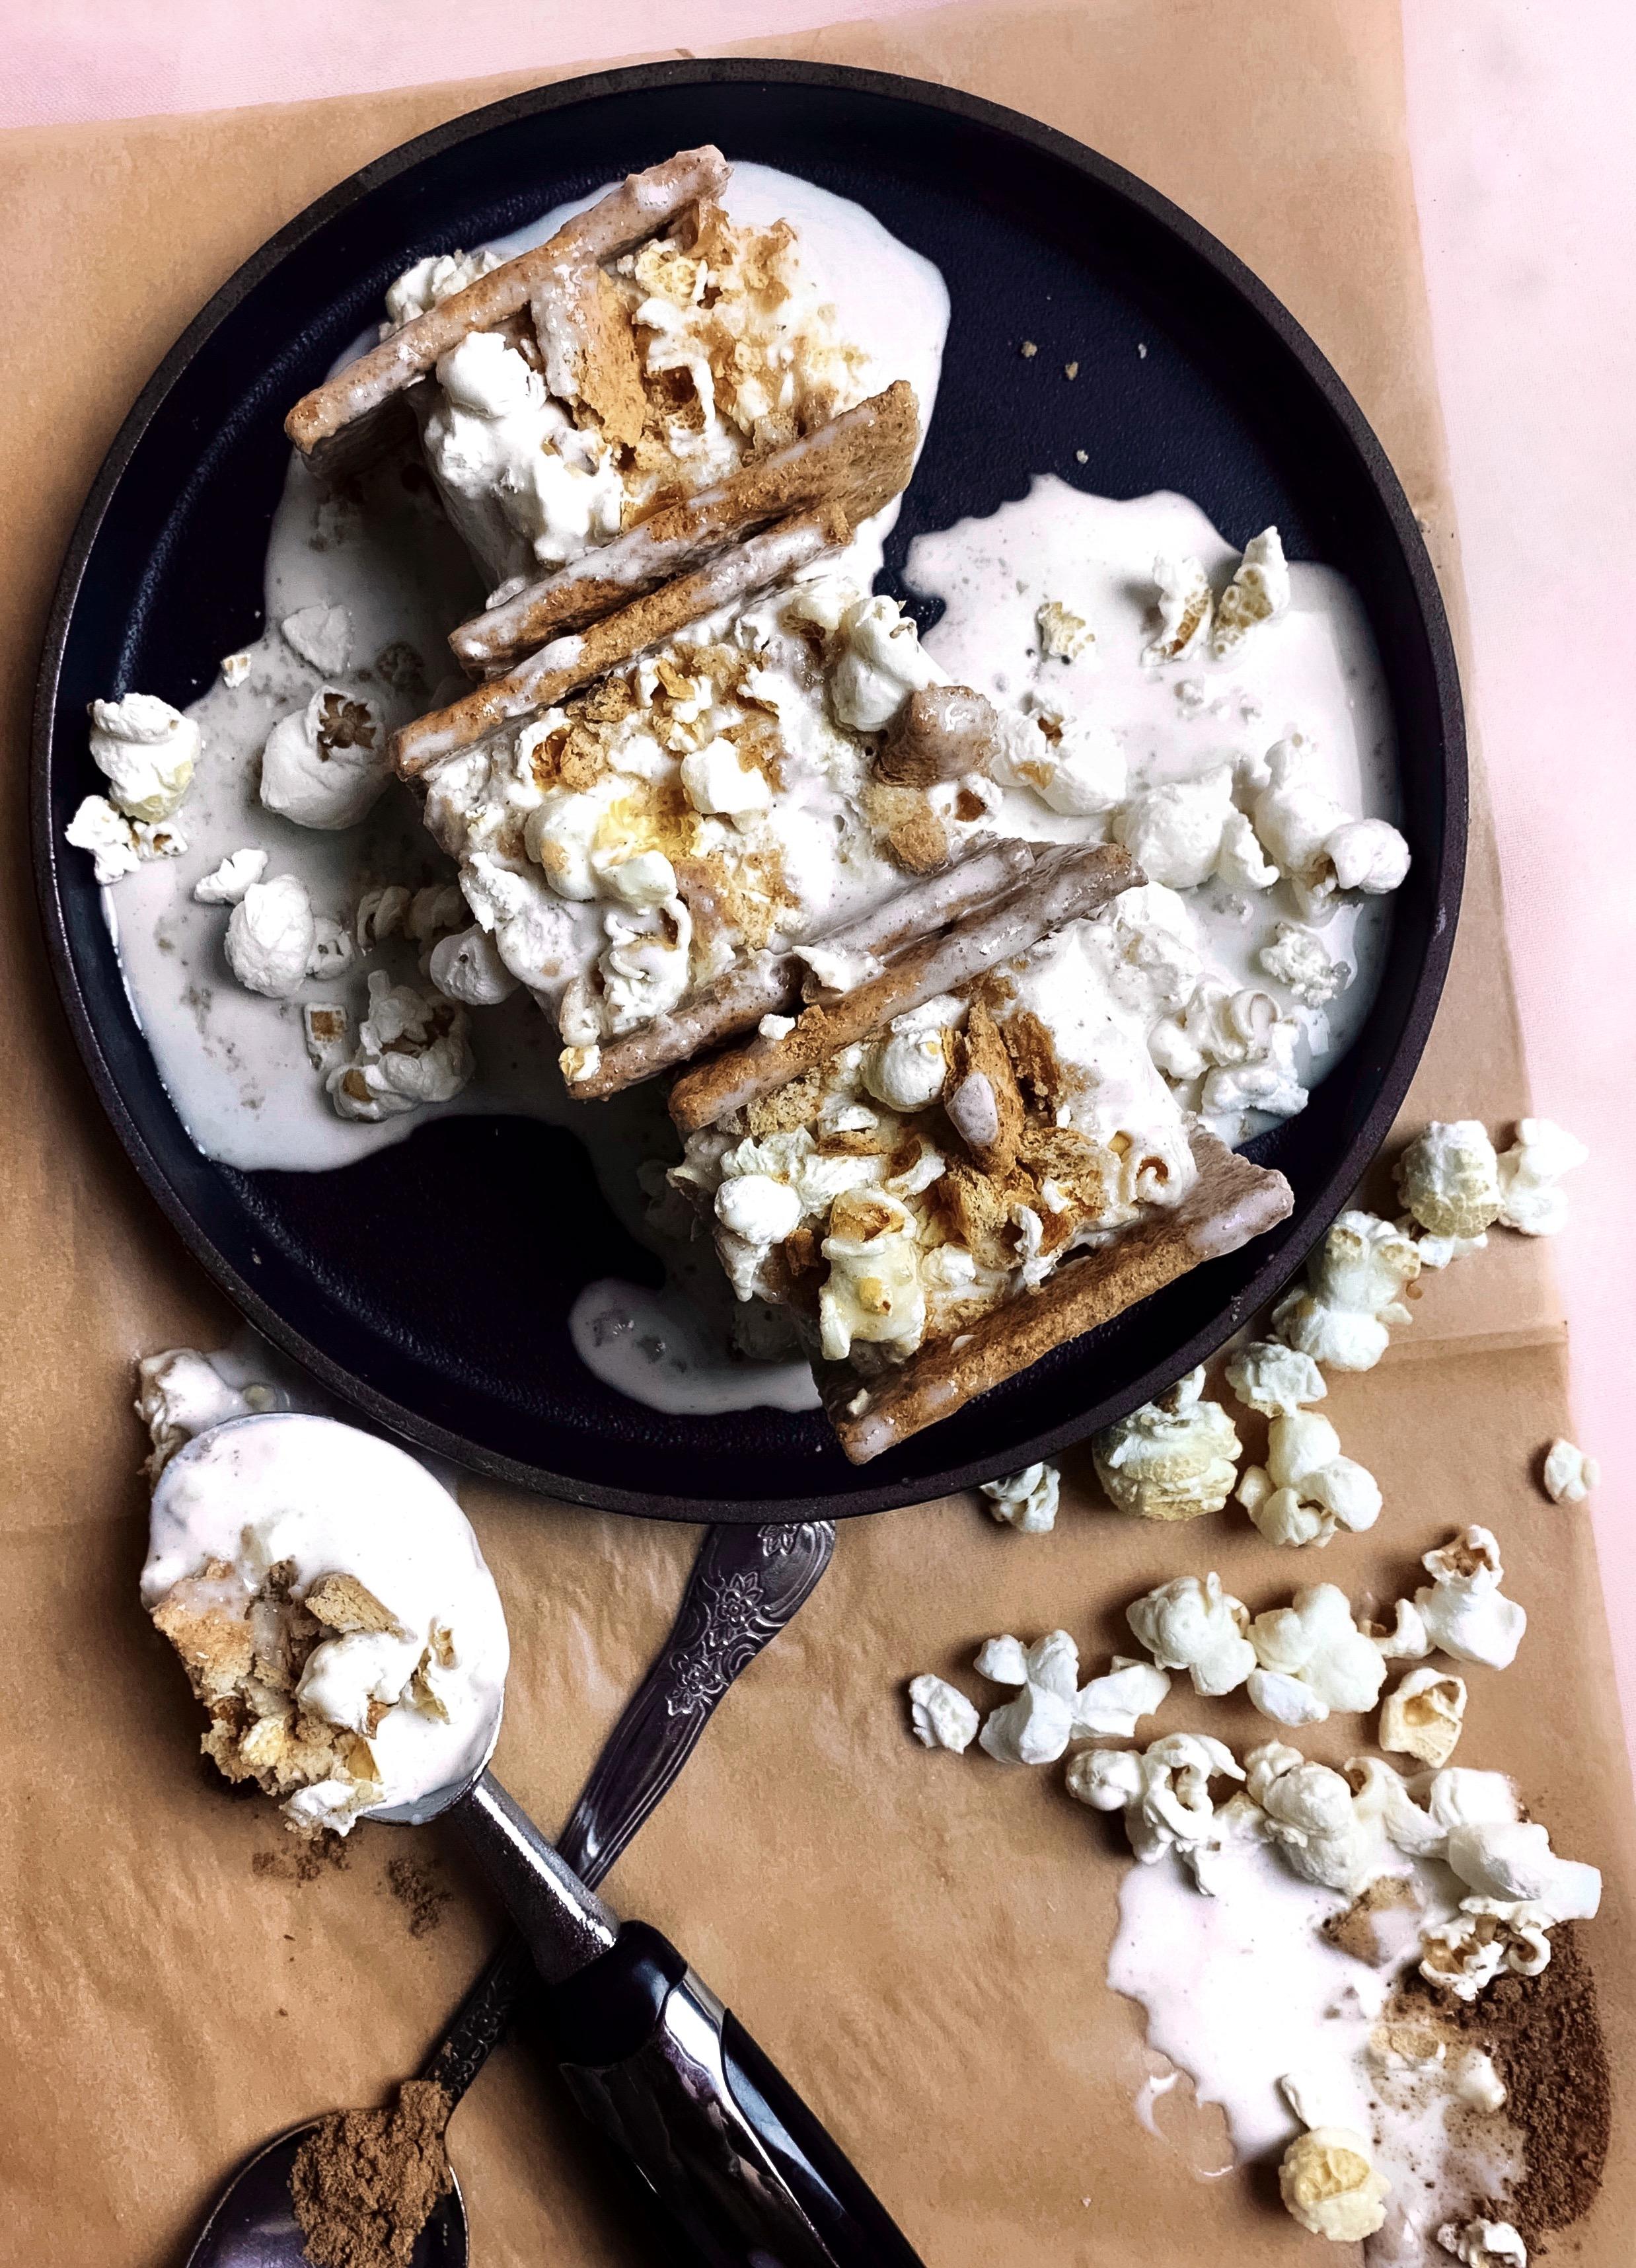 No-Churn Popcorn Five Spice Ice Cream Sandwiches - Brad & Butter | Oct 7, 2019